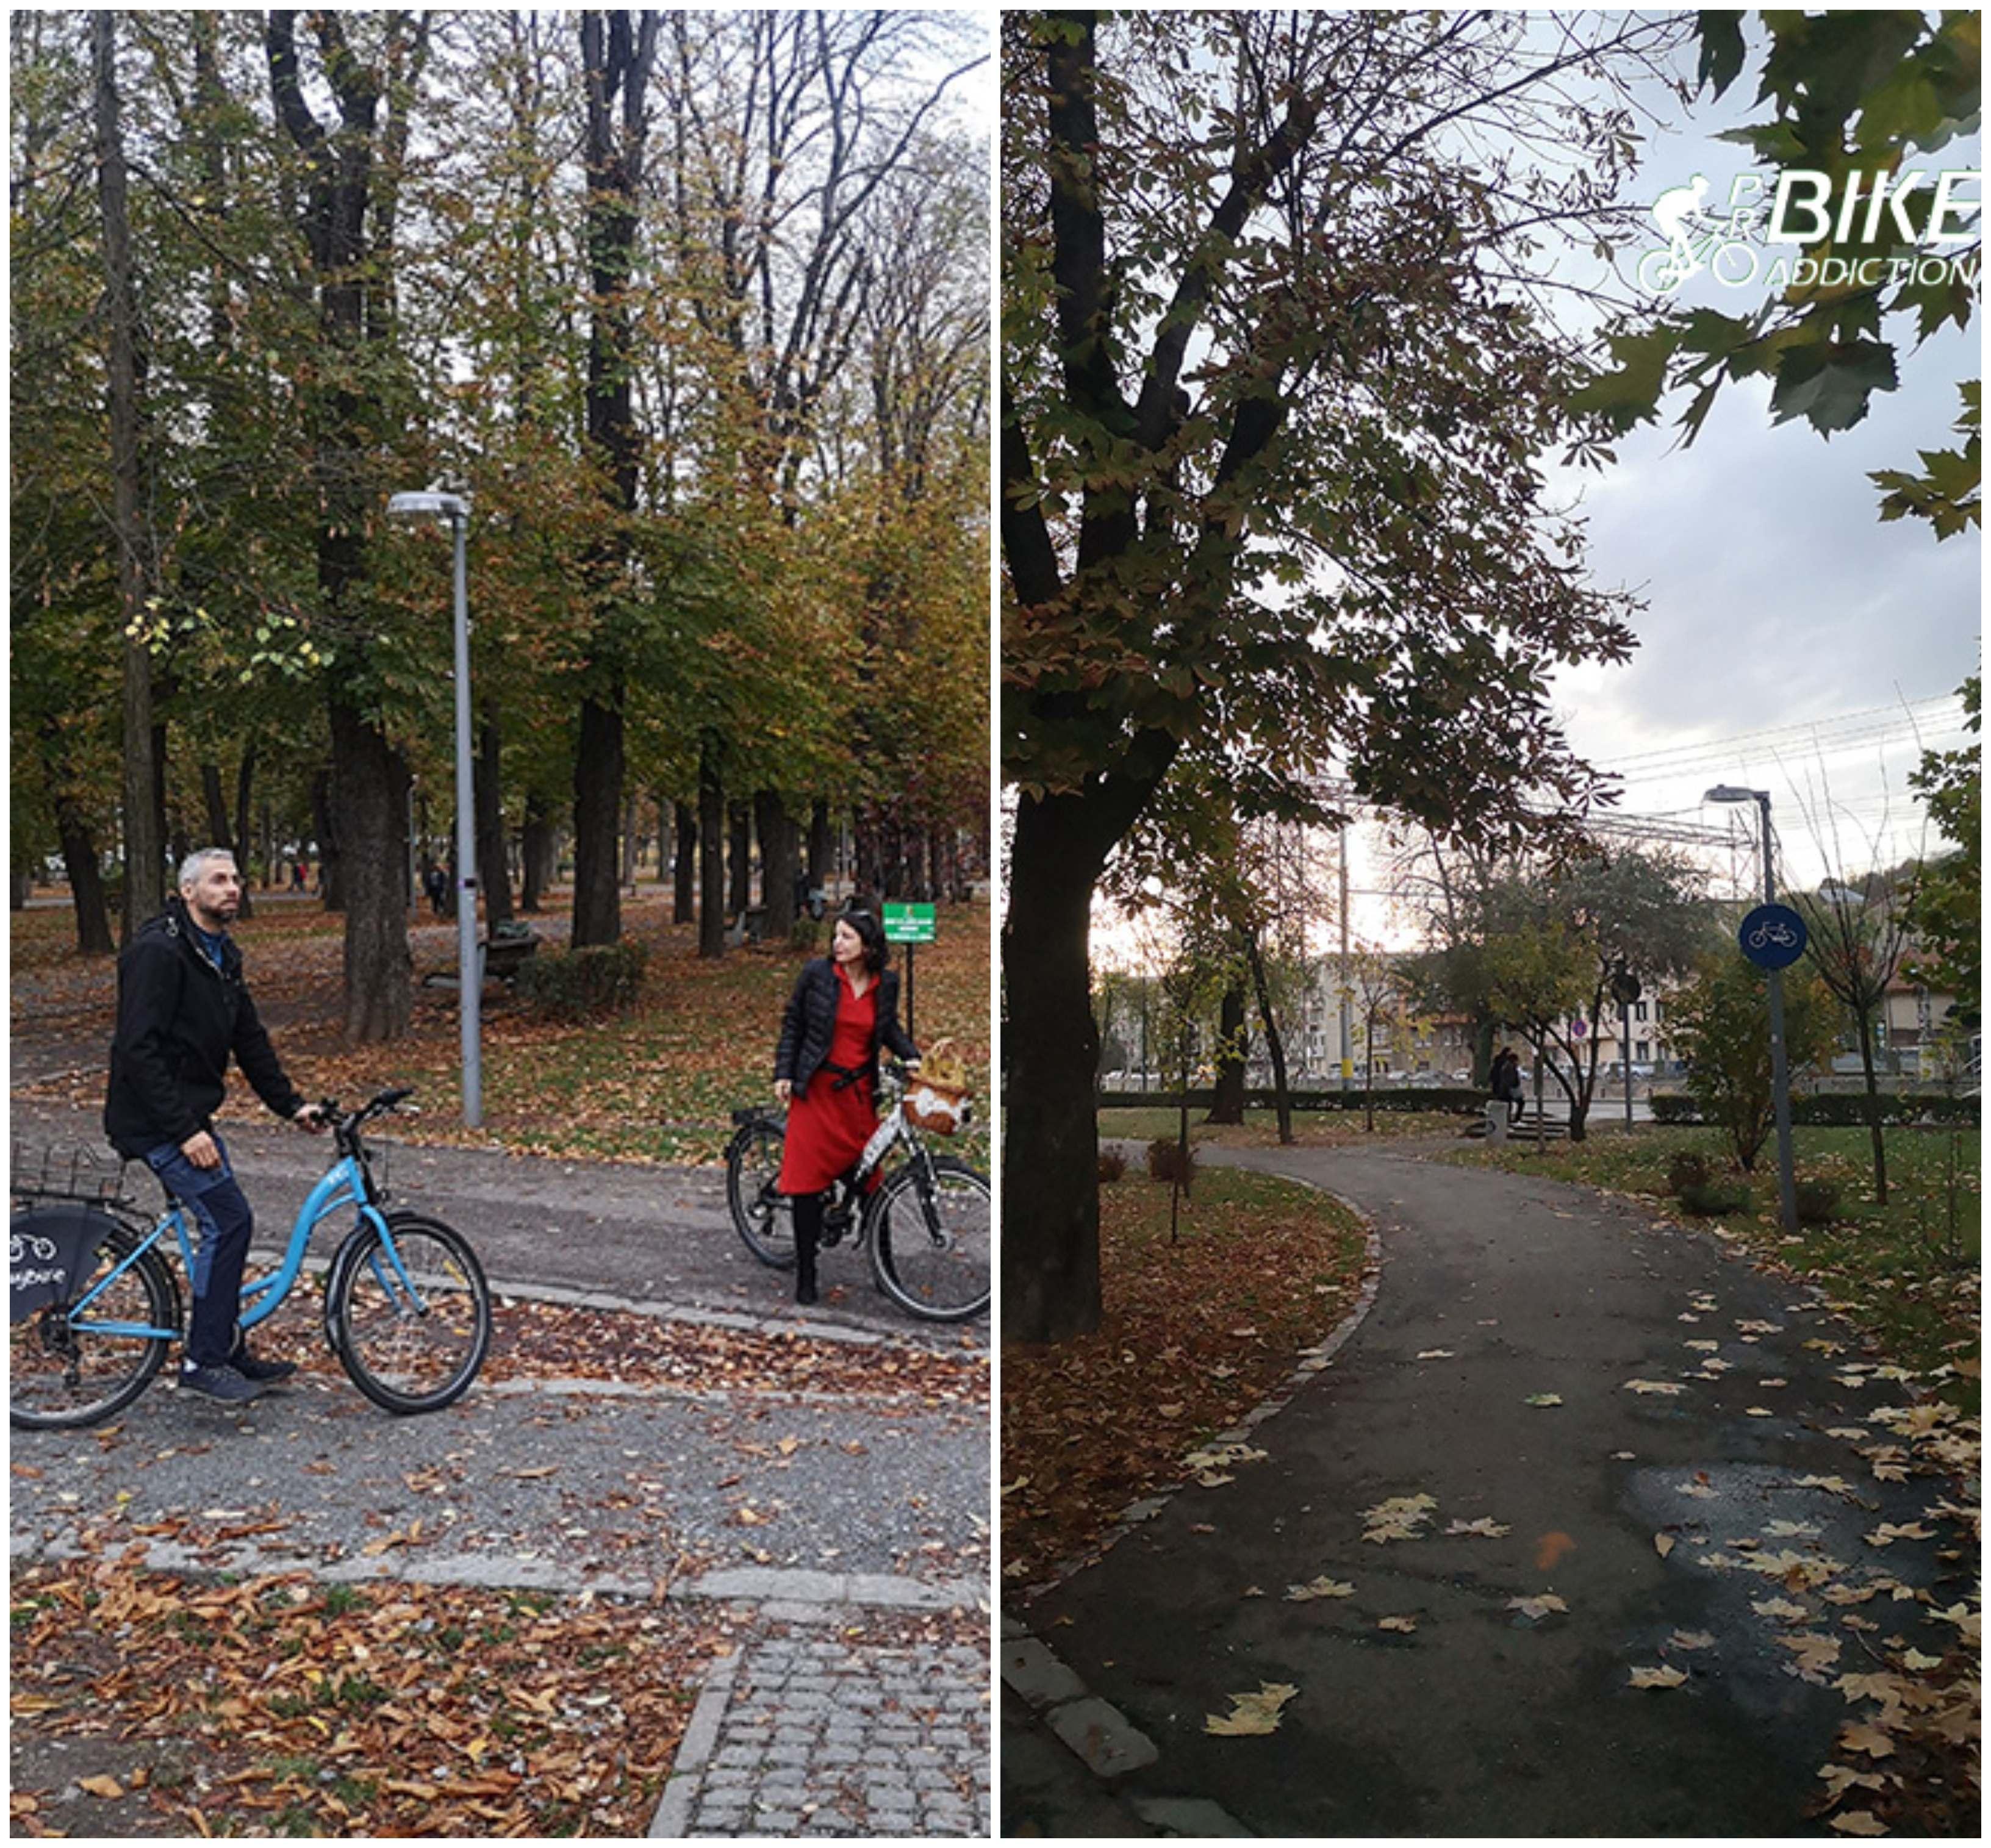 probikeaddiction cluj parcul central infrastructura biciclistica